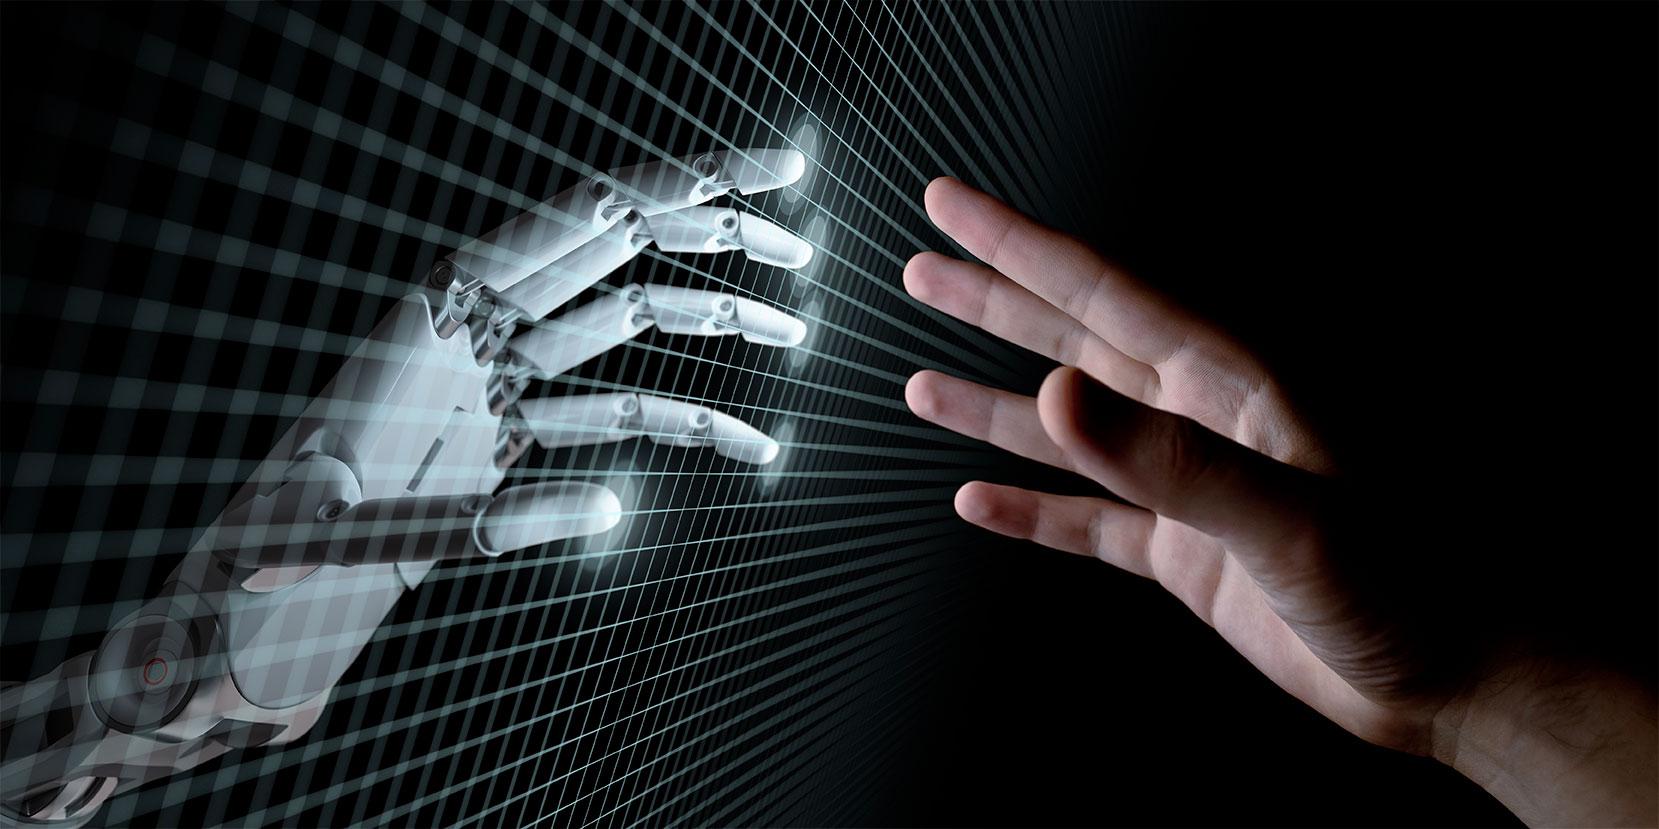 grlab-accueil-generation-robots